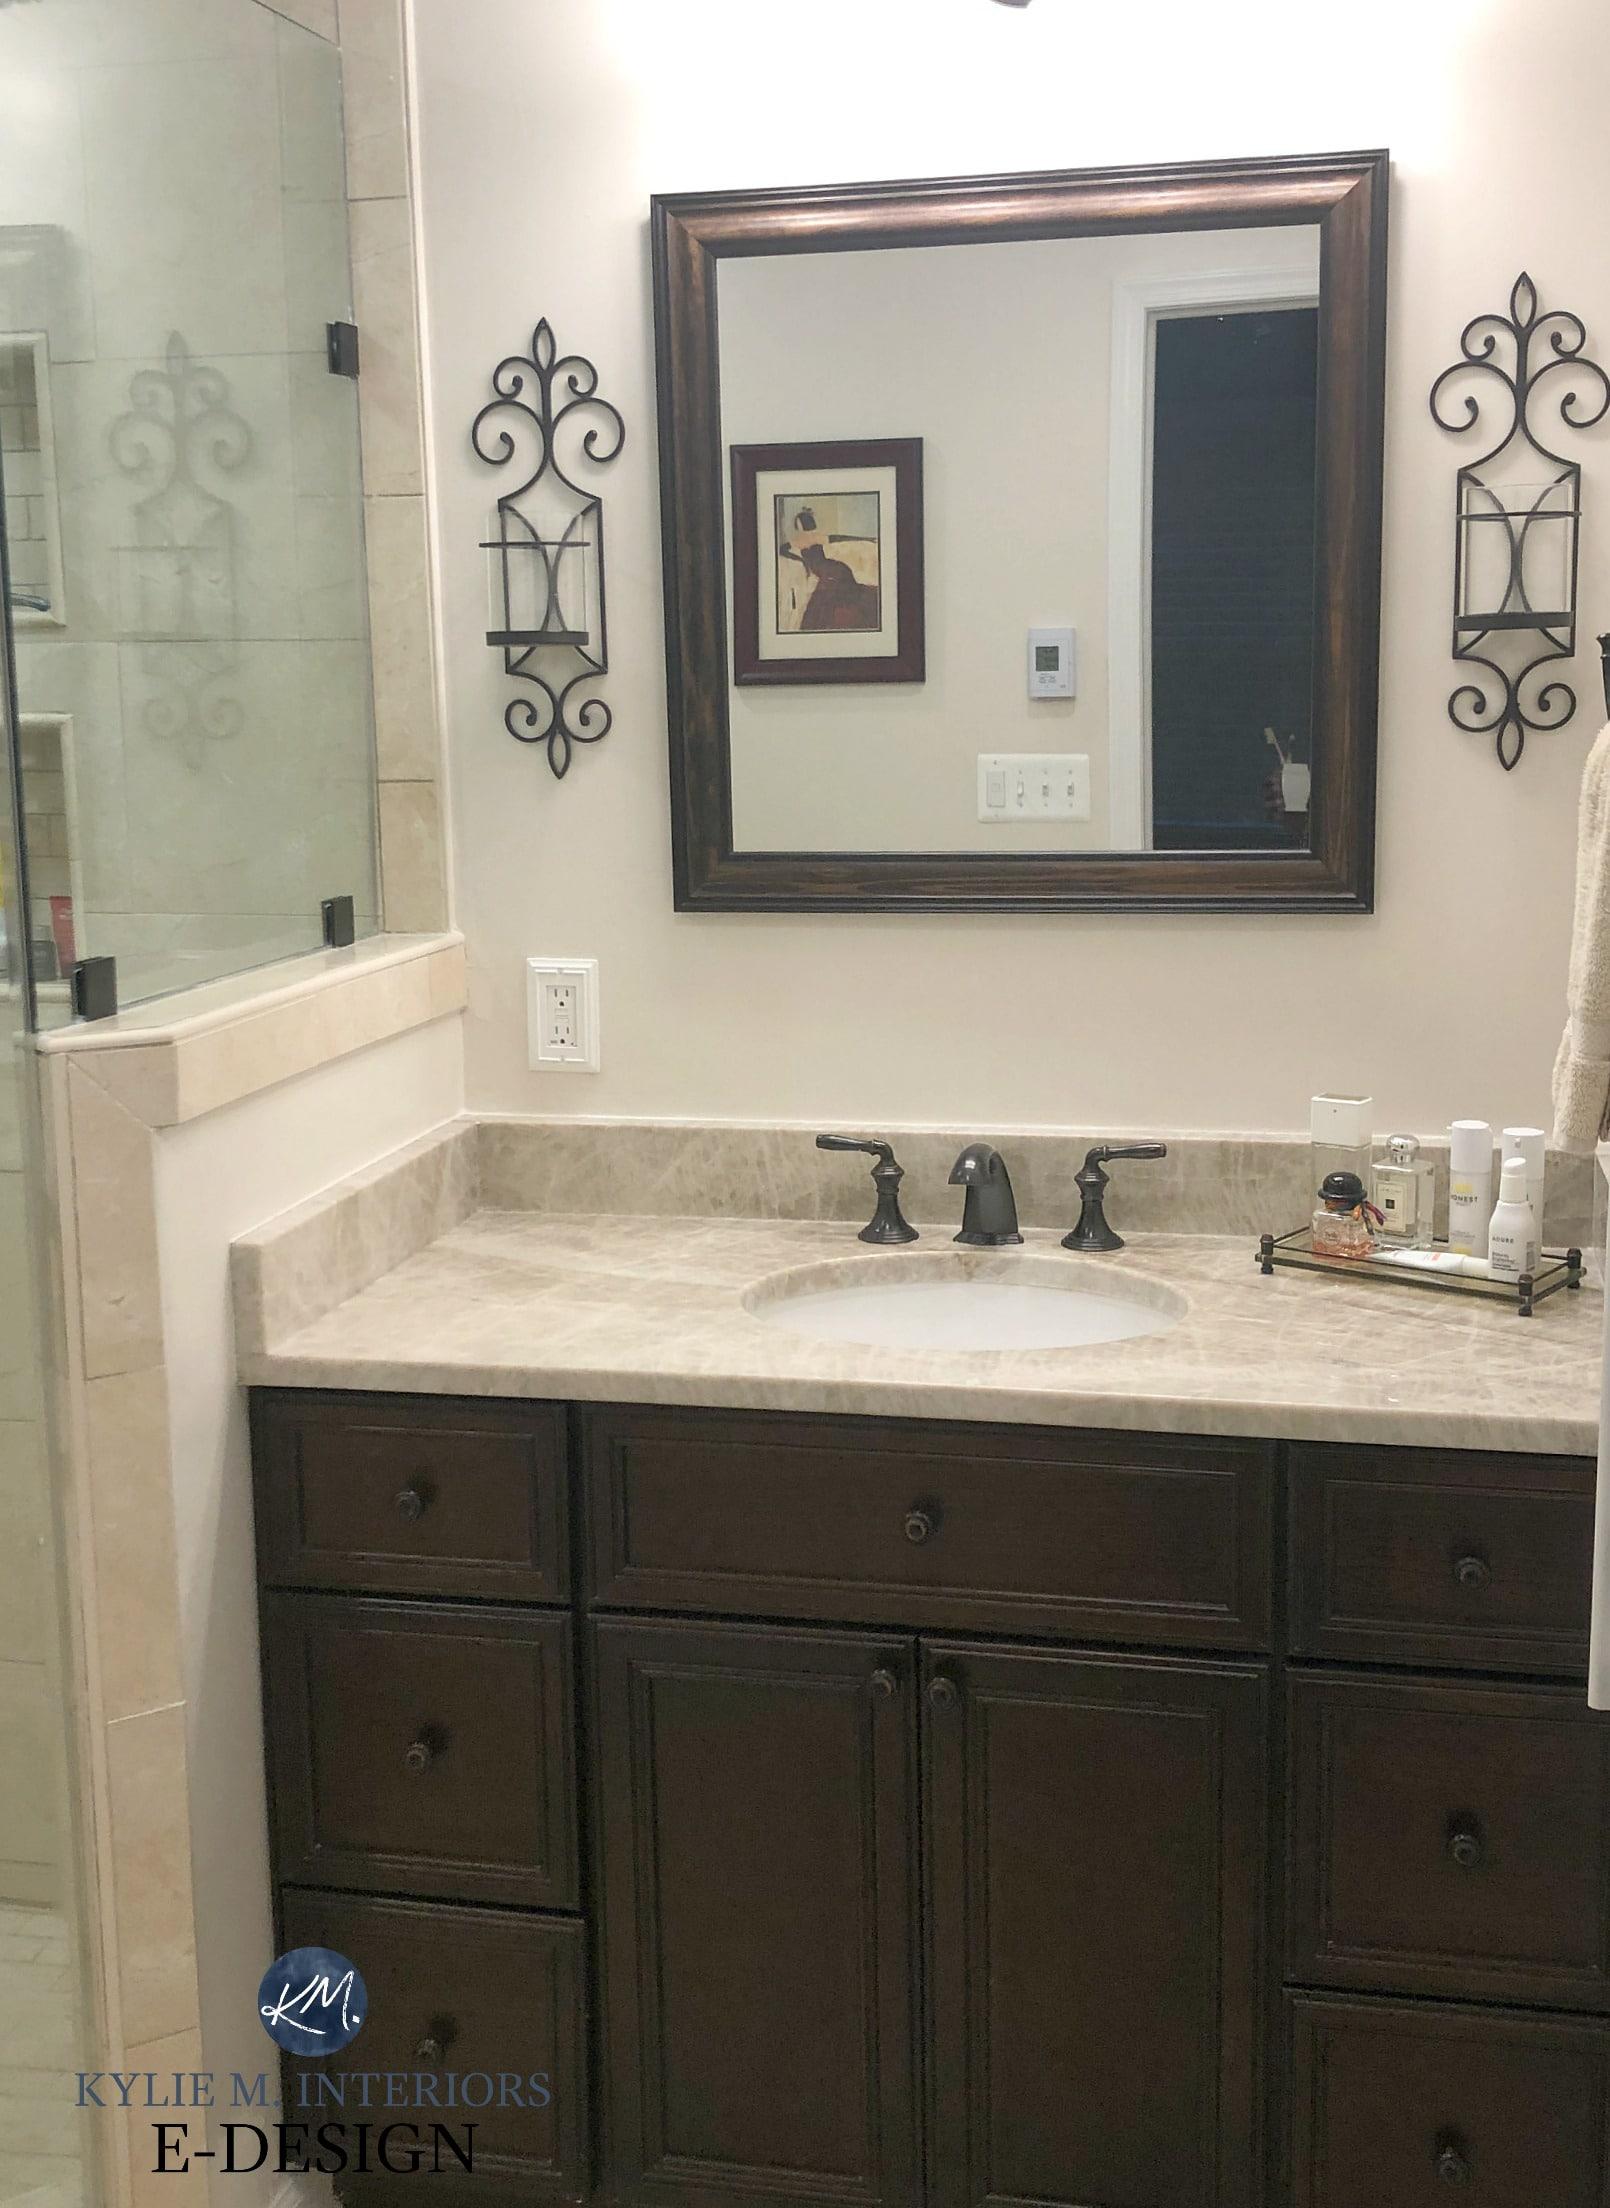 Bathroom Vanity Travertine Tile And Countertop Espresso